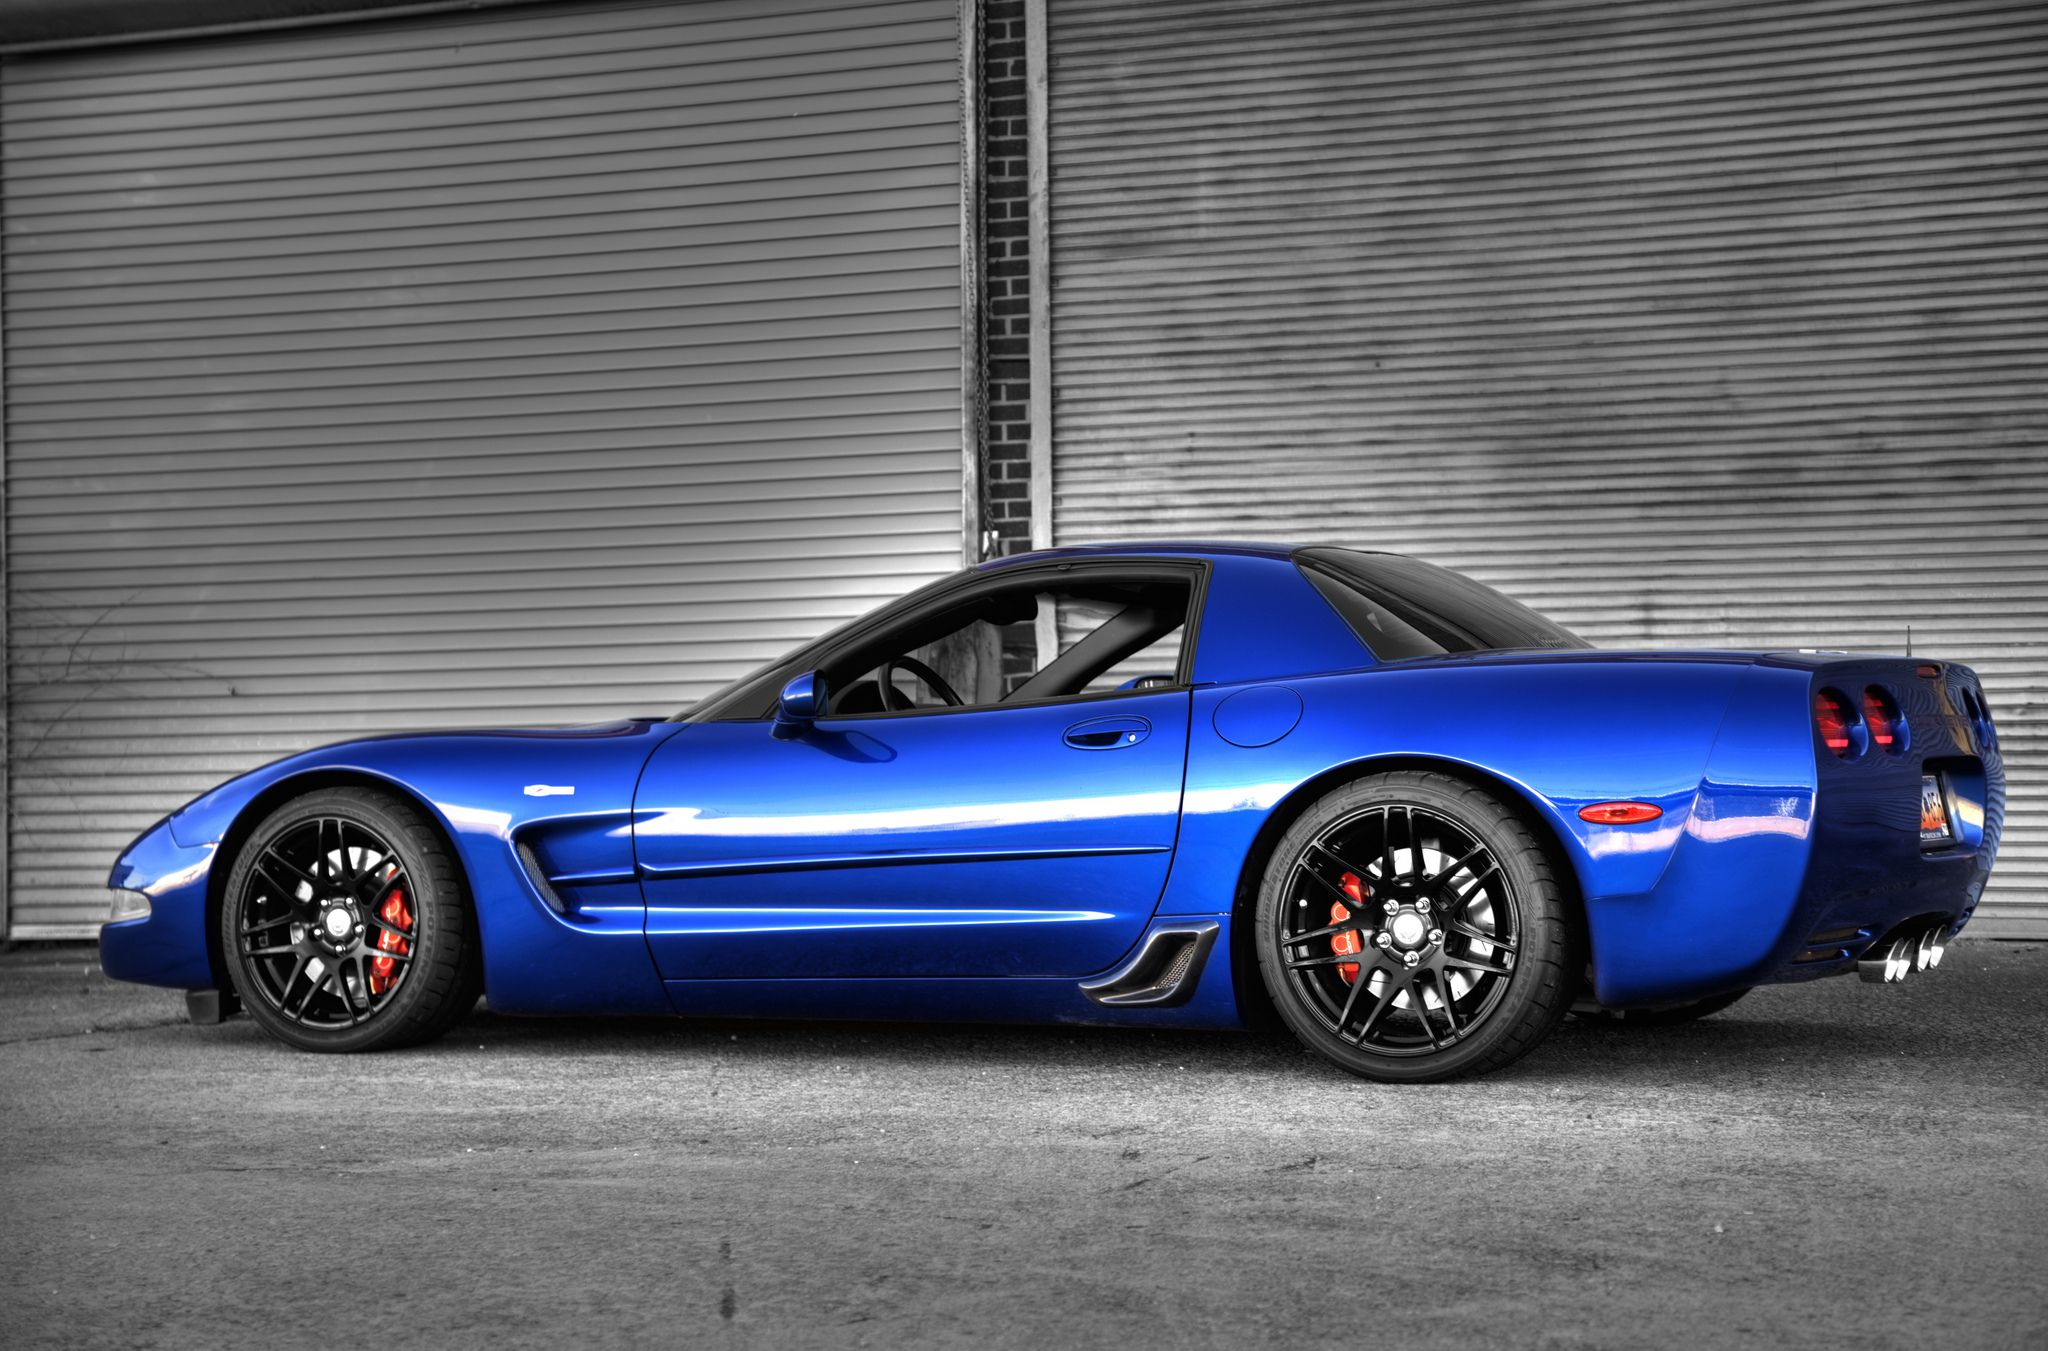 2003 Corvette Z06 2003 Corvette Chevy Corvette Corvette Z06